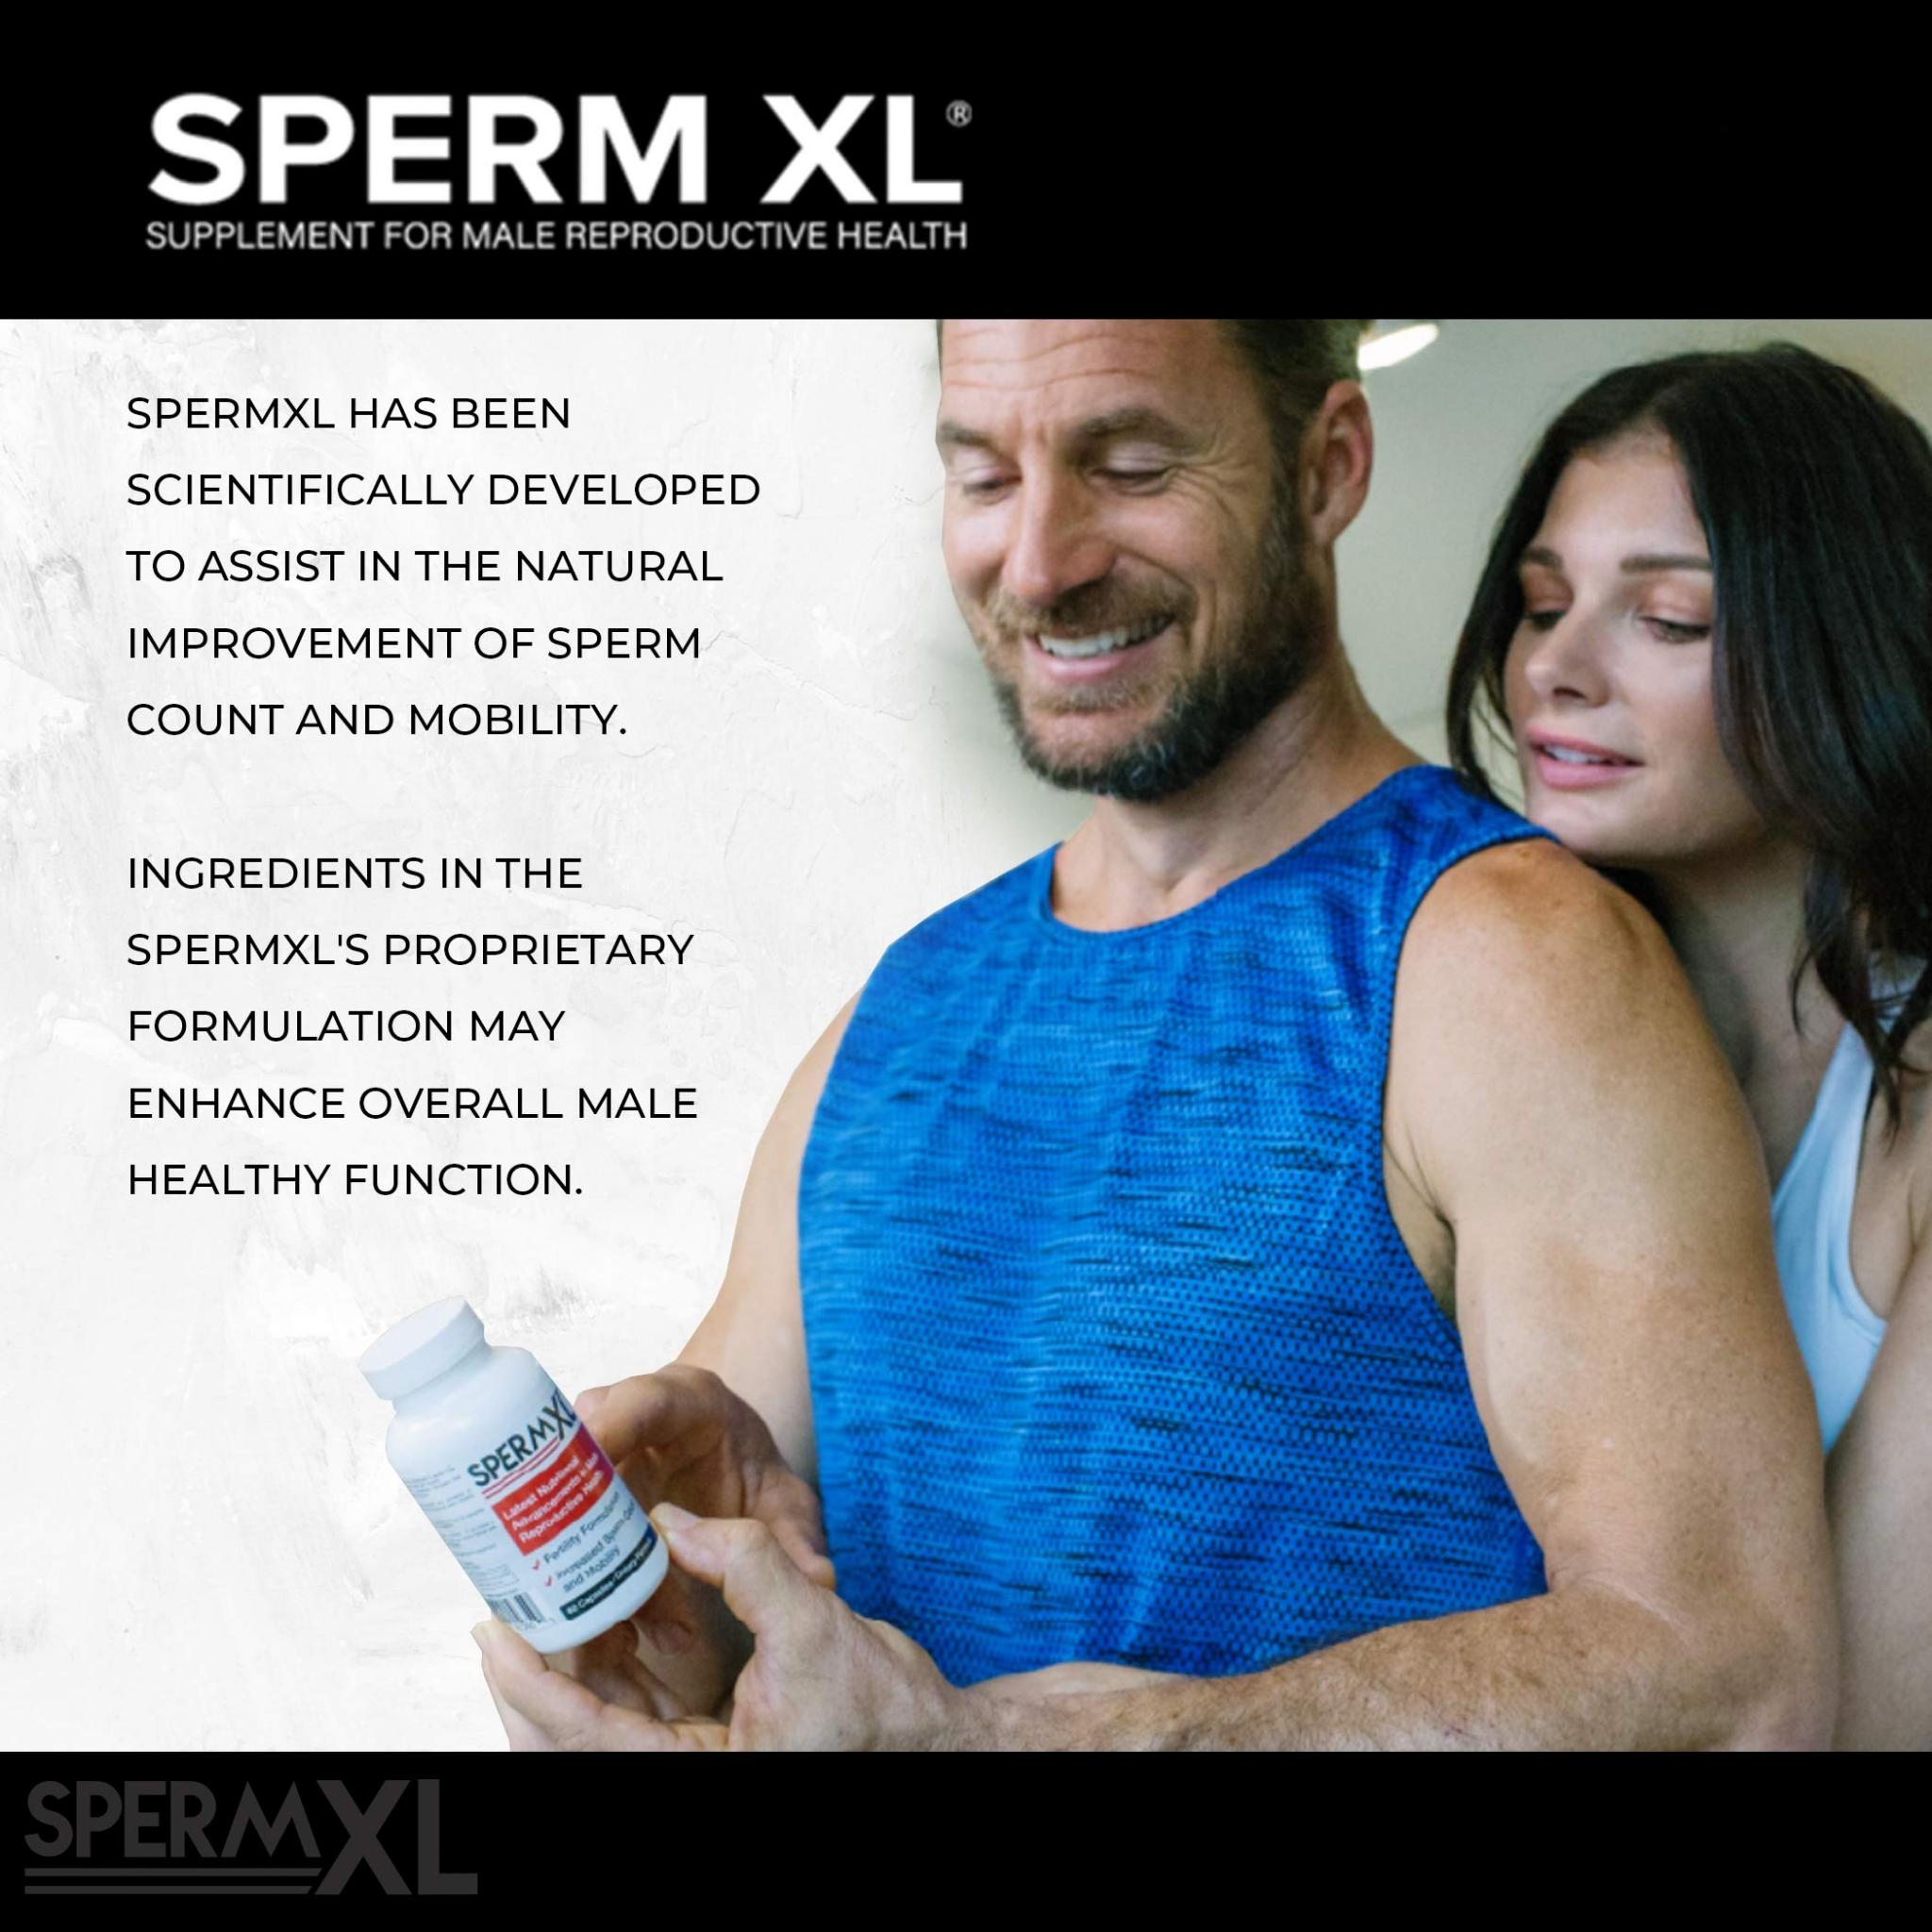 SPERM XL - Sperm-Count, Fertility & Mobility Nutritional